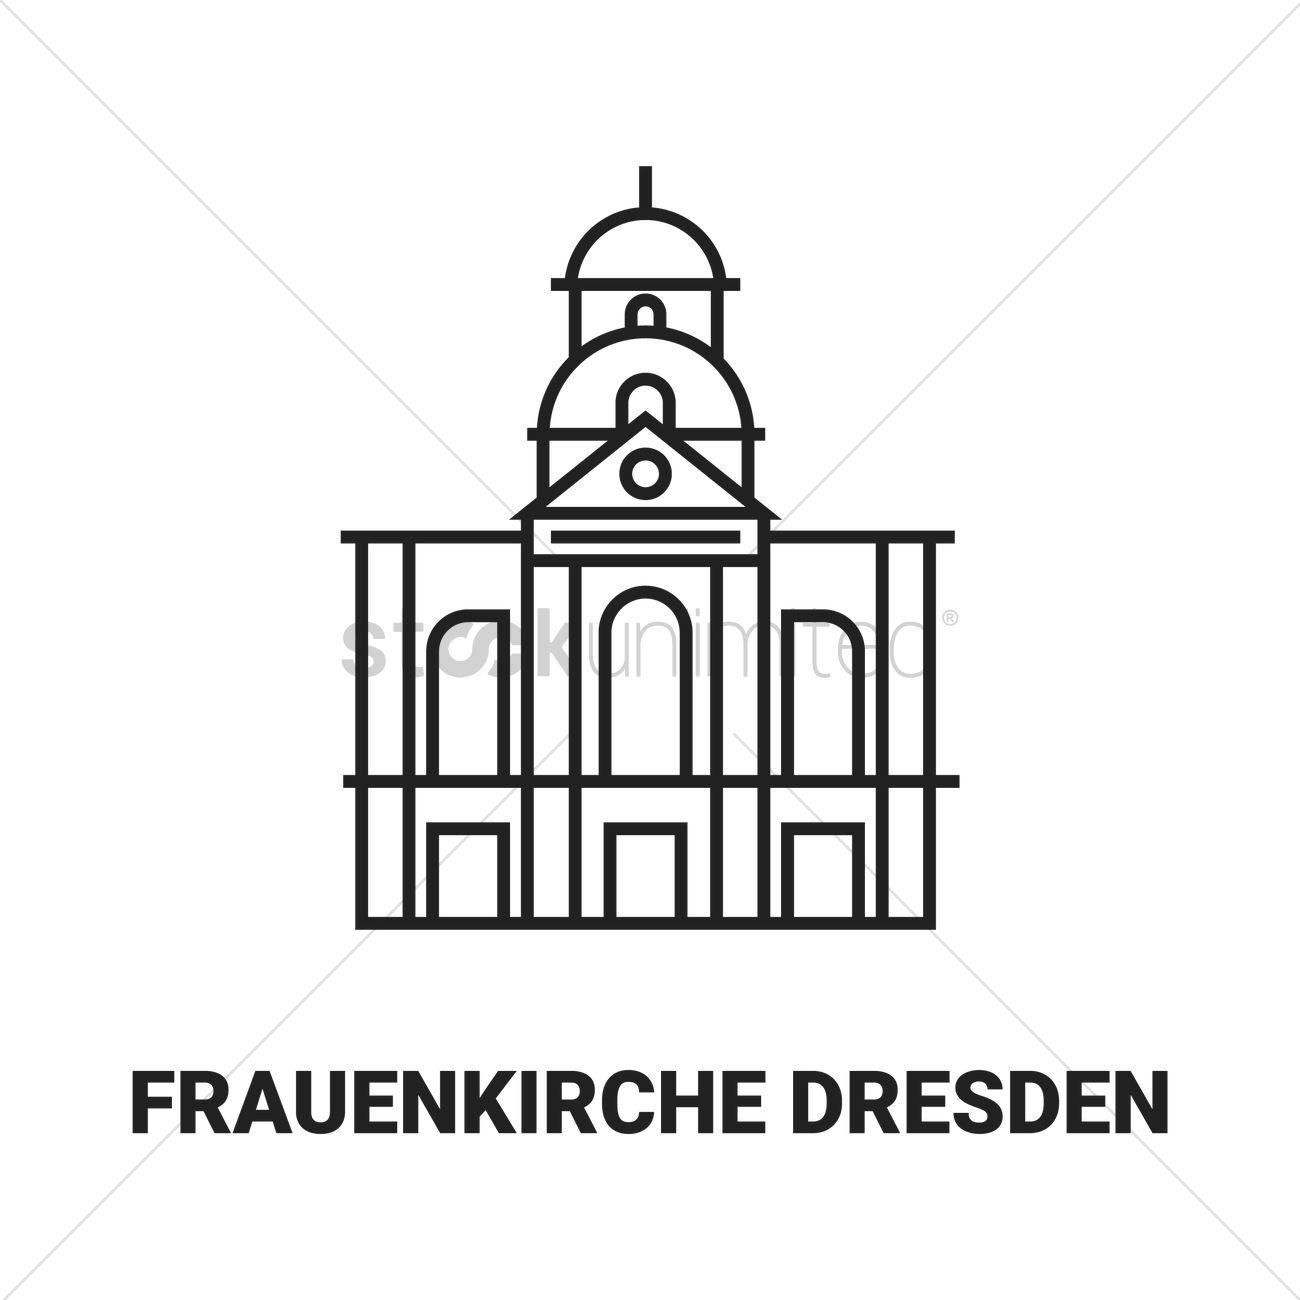 Frauenkirche dresden Vector Image.